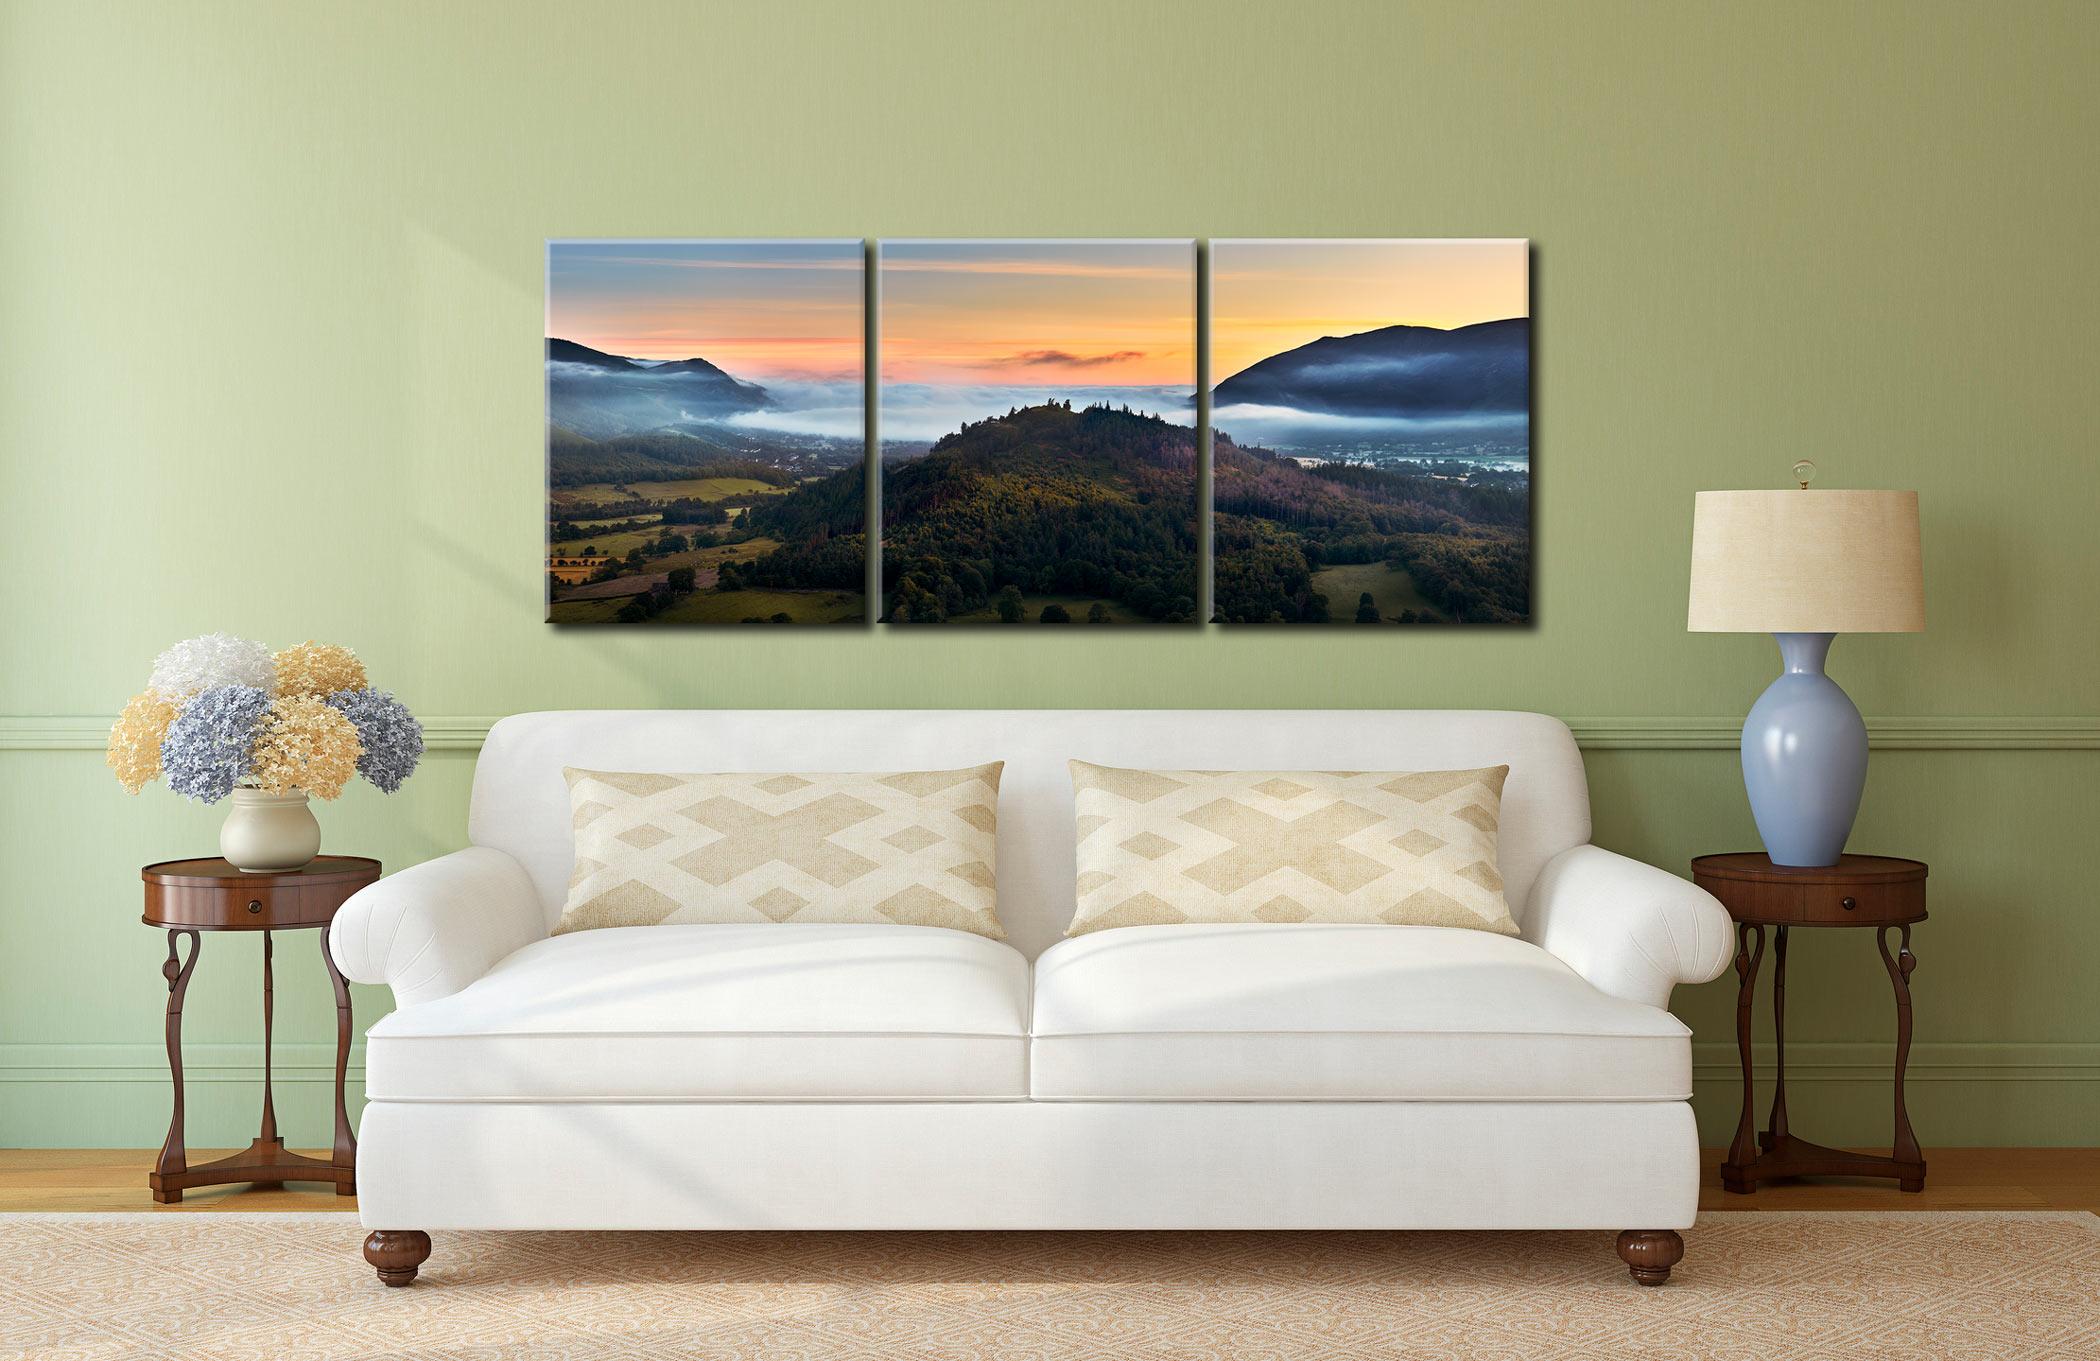 Dawn Mists Over Bassenthwaite Lake  - 3 Panel Canvas on Wall